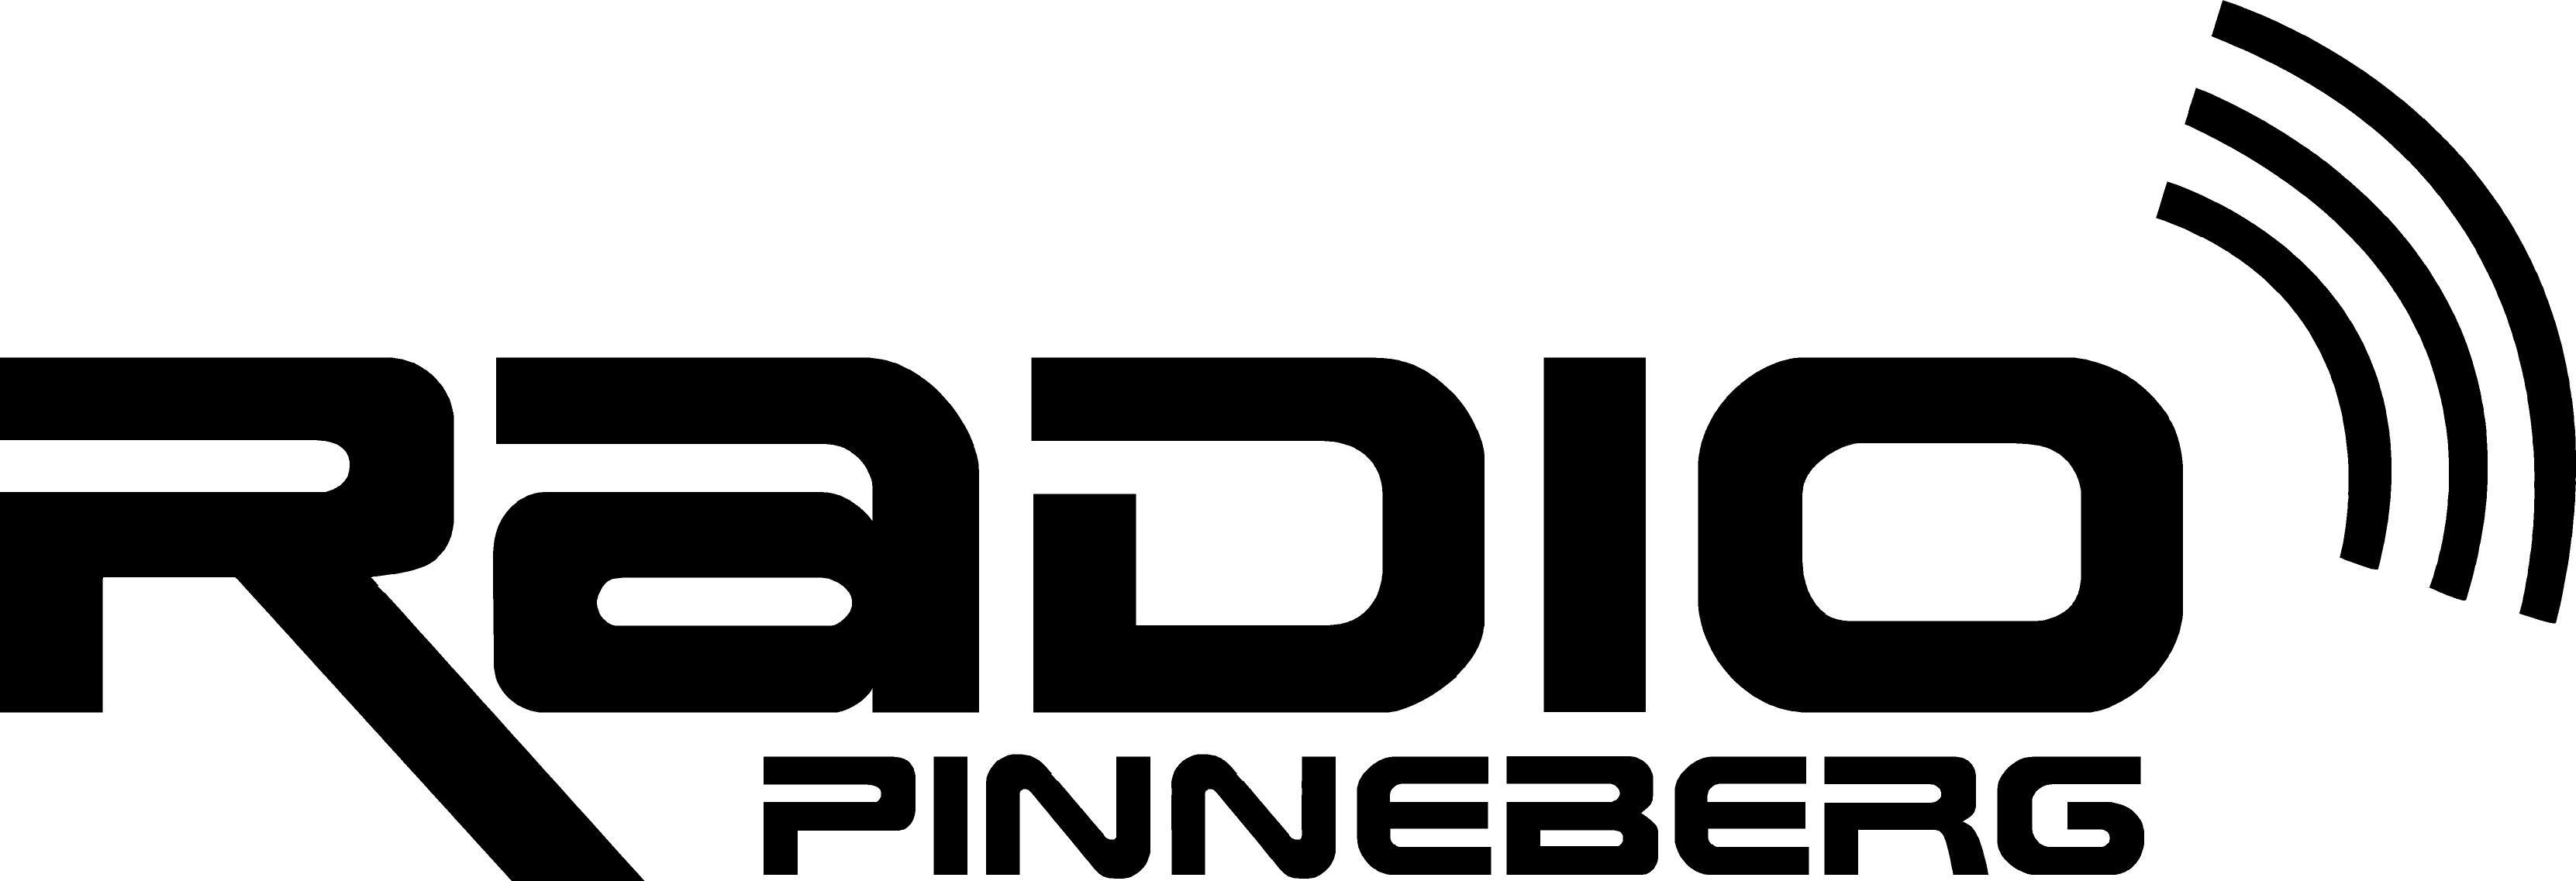 télécharger logo radio